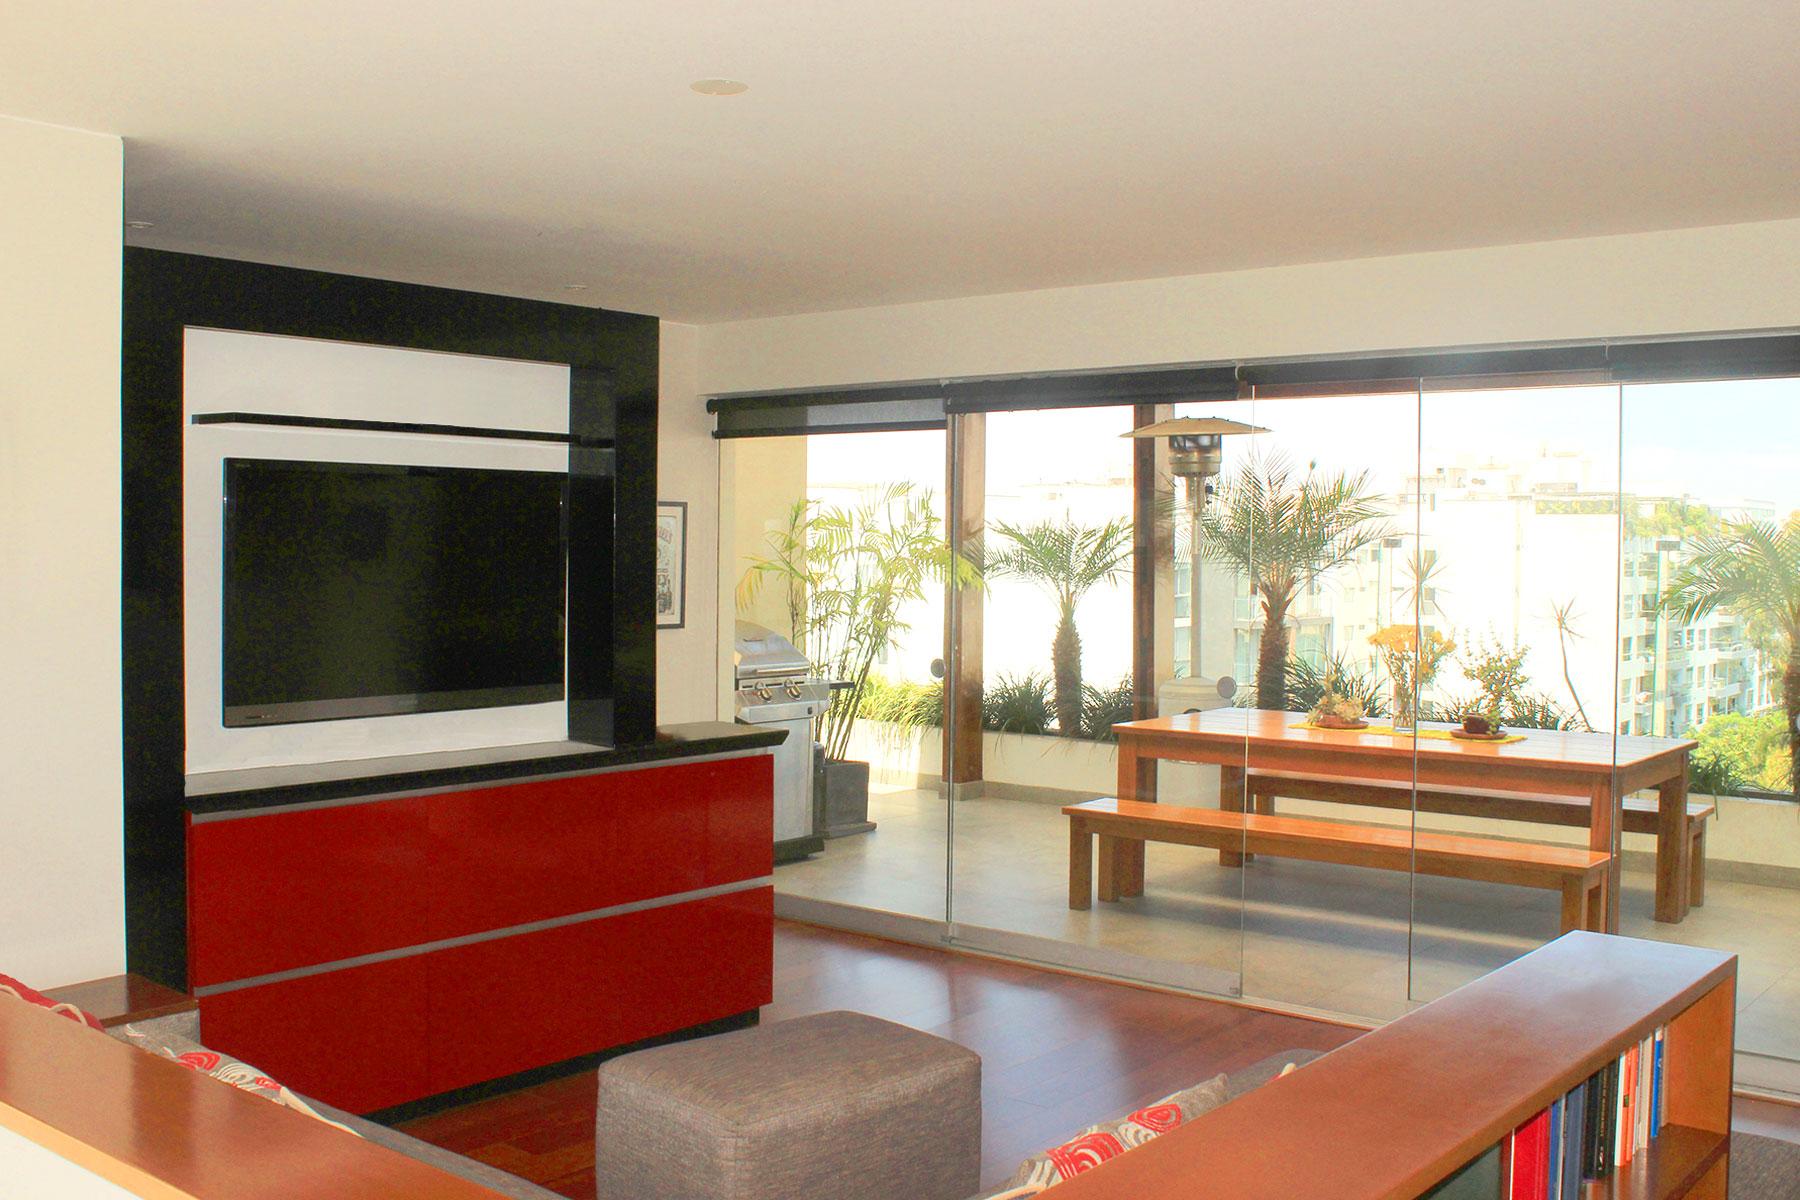 Apartment for Sale at Moderno duplex frente a parque Baden Powell Almirante Lord Nelson Miraflores, Lima, 18 Peru